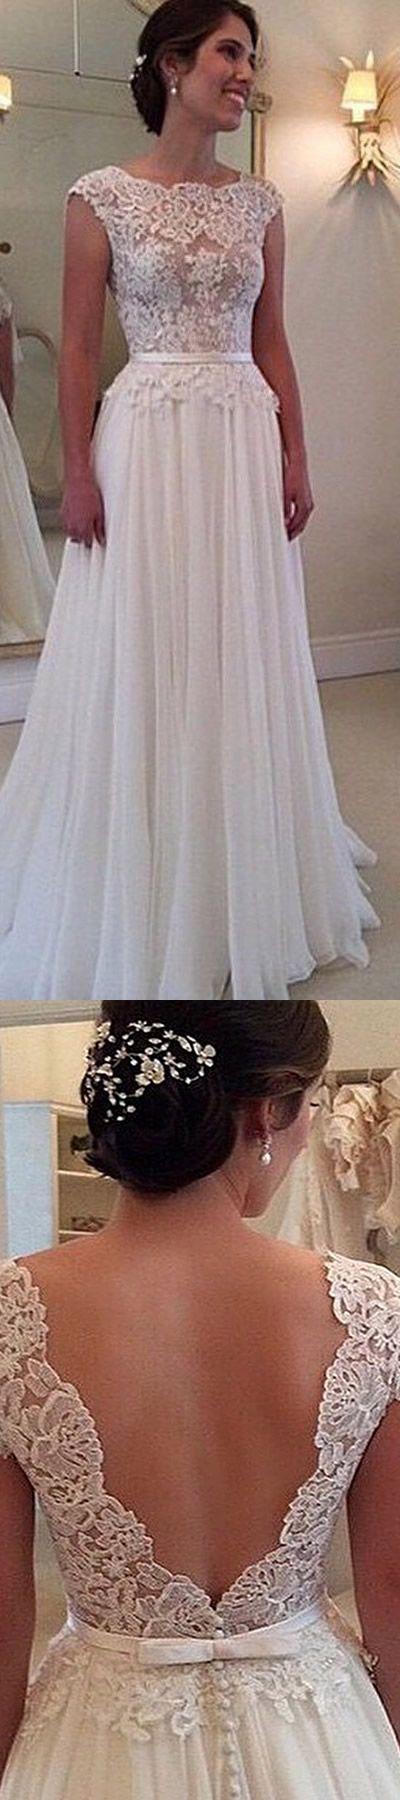 Sexy Backless Semi Sheer Lace Bodice Bateau Neck Low V Back Chiffon Wedding Dress,beach wedding dresses, bridal gown, open back wedding dresses